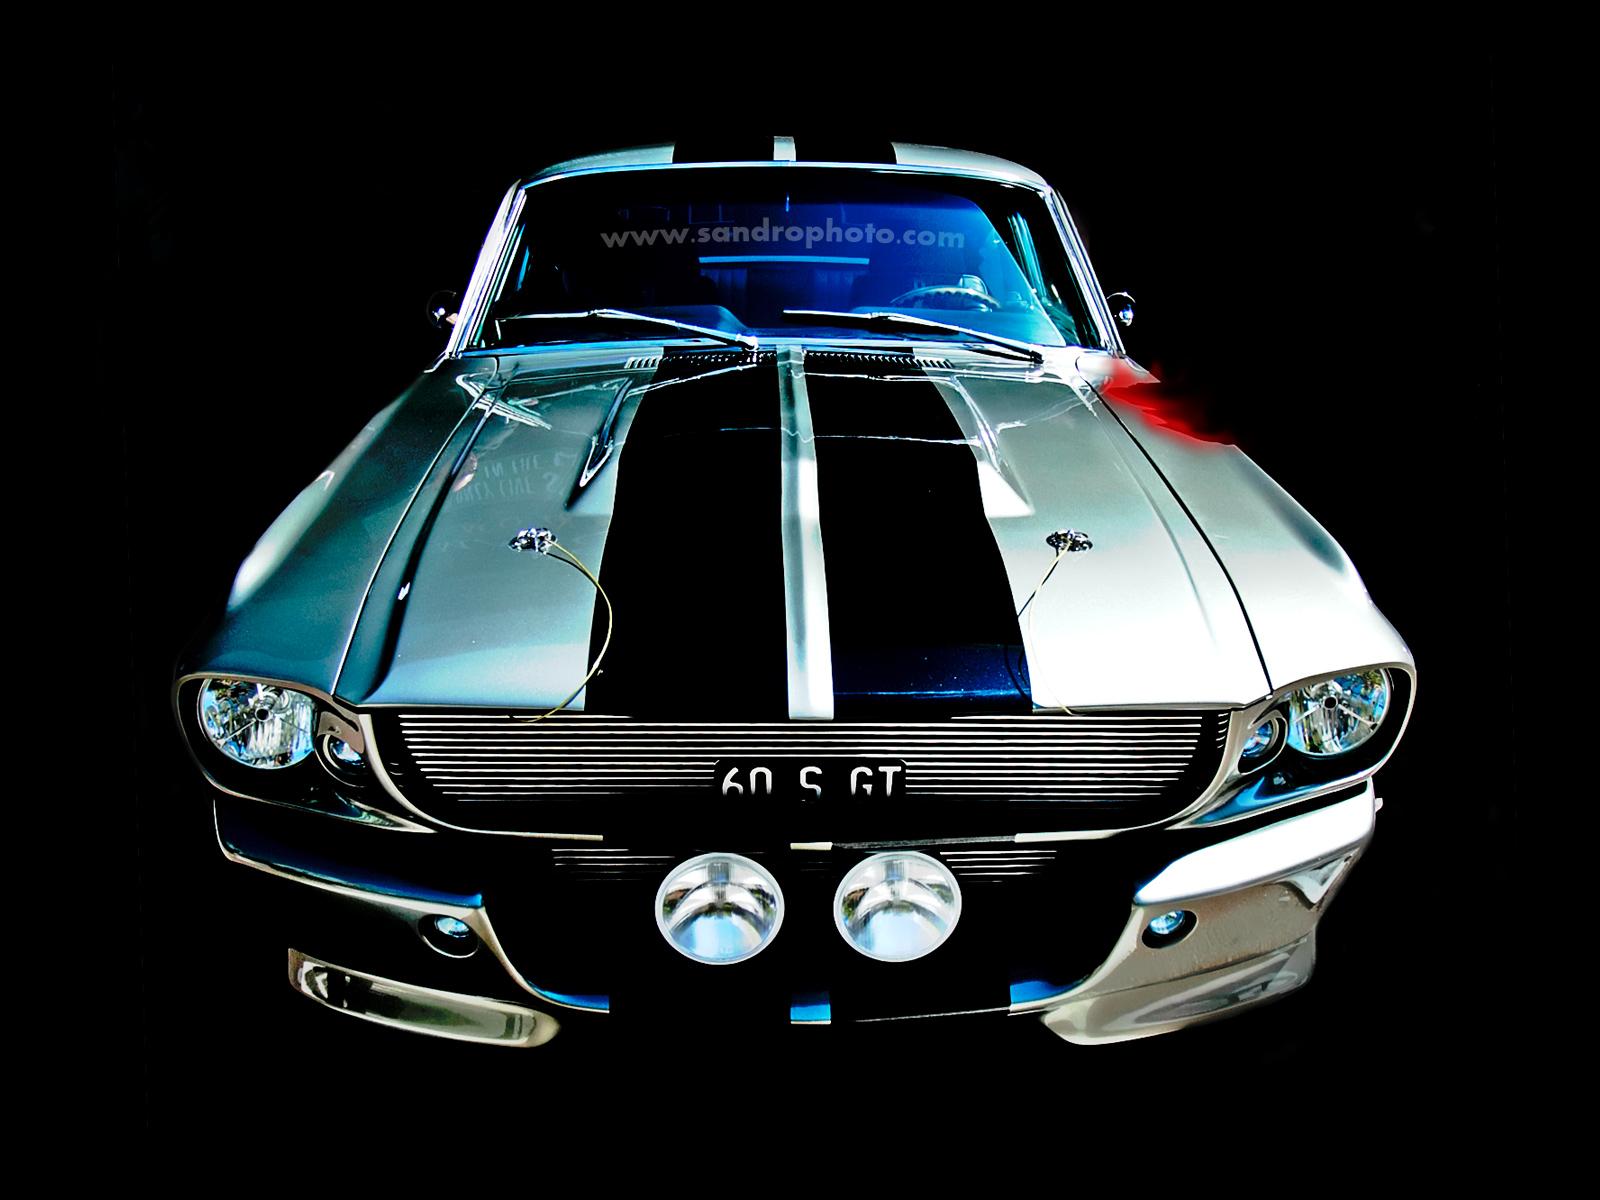 Muscle car wallpapers for desktop Car wallpapers for desktop Car 1600x1200